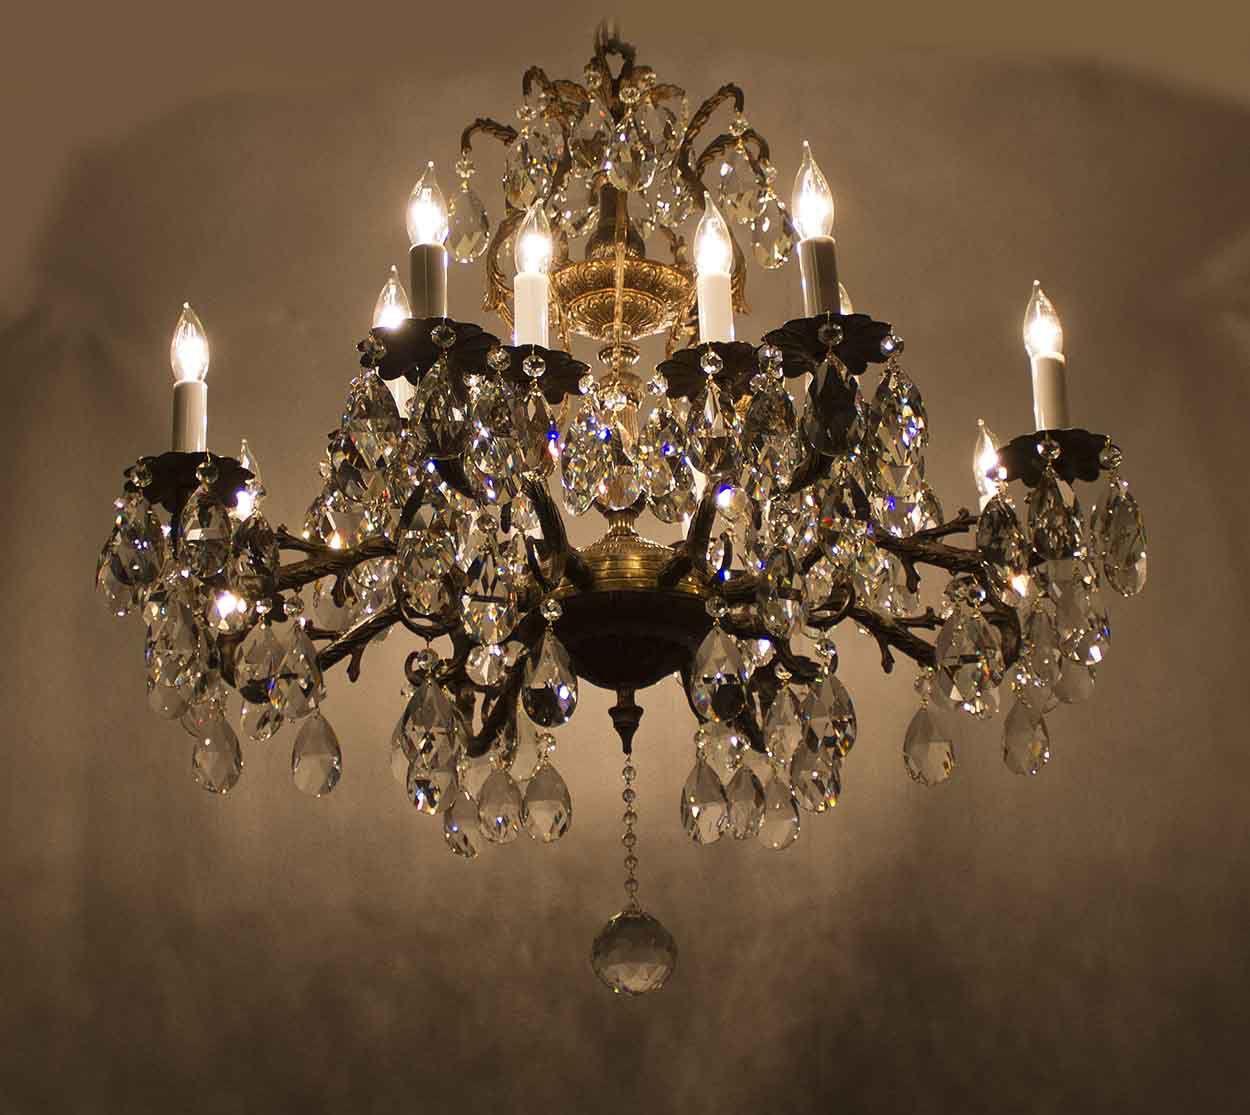 Refurbished 1940 S Antique Chandelier By Crystal Prism World